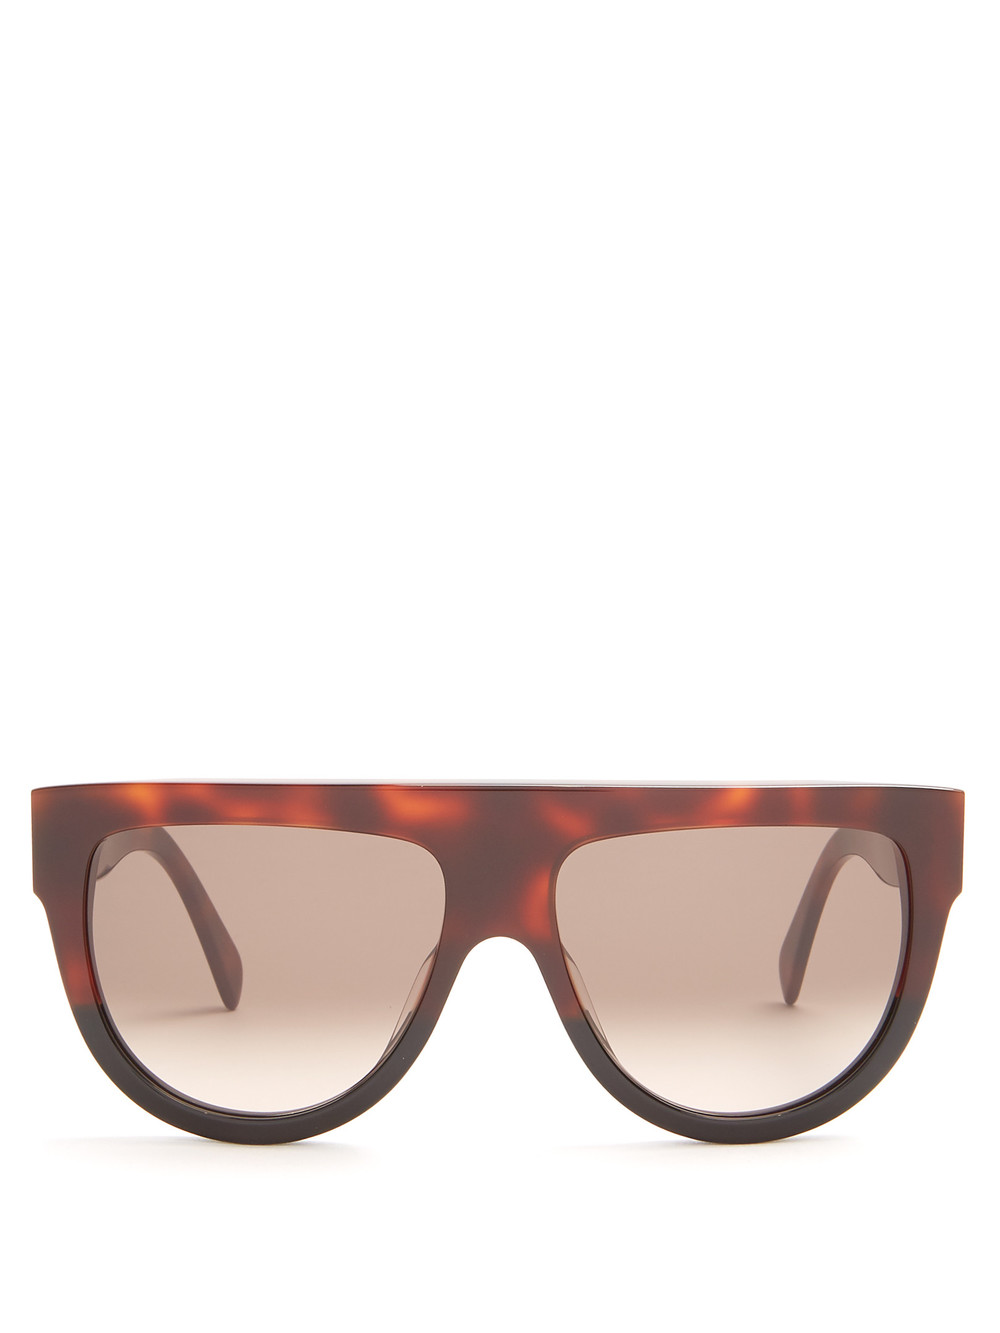 Designer Sunglasses  Womens Sunglasses  Fendi